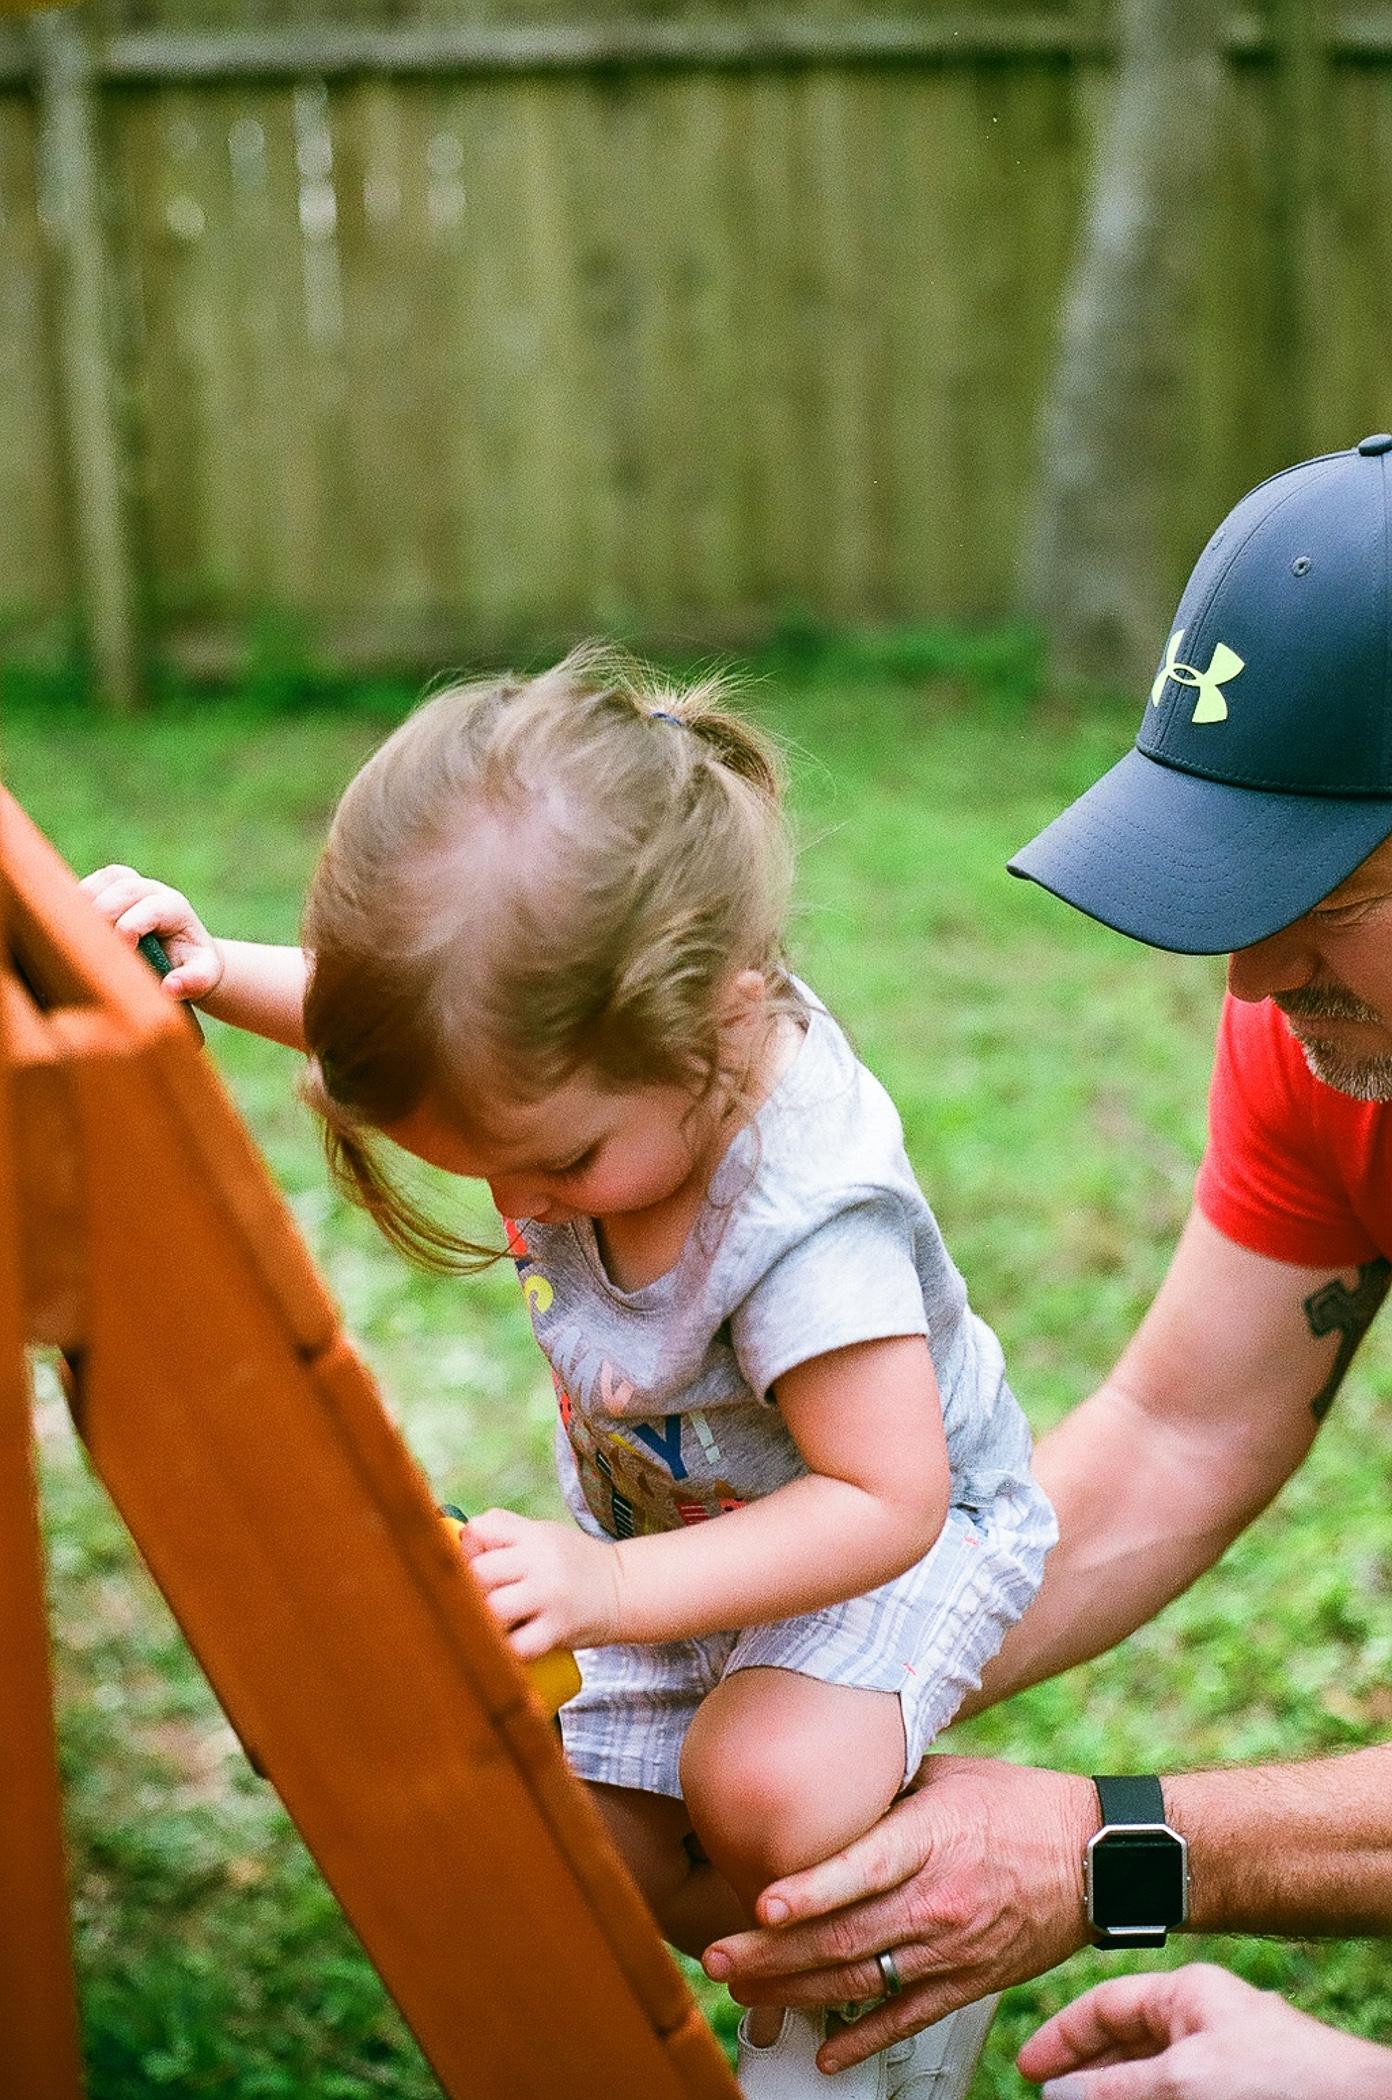 Big Daddy, teach me how to climb!